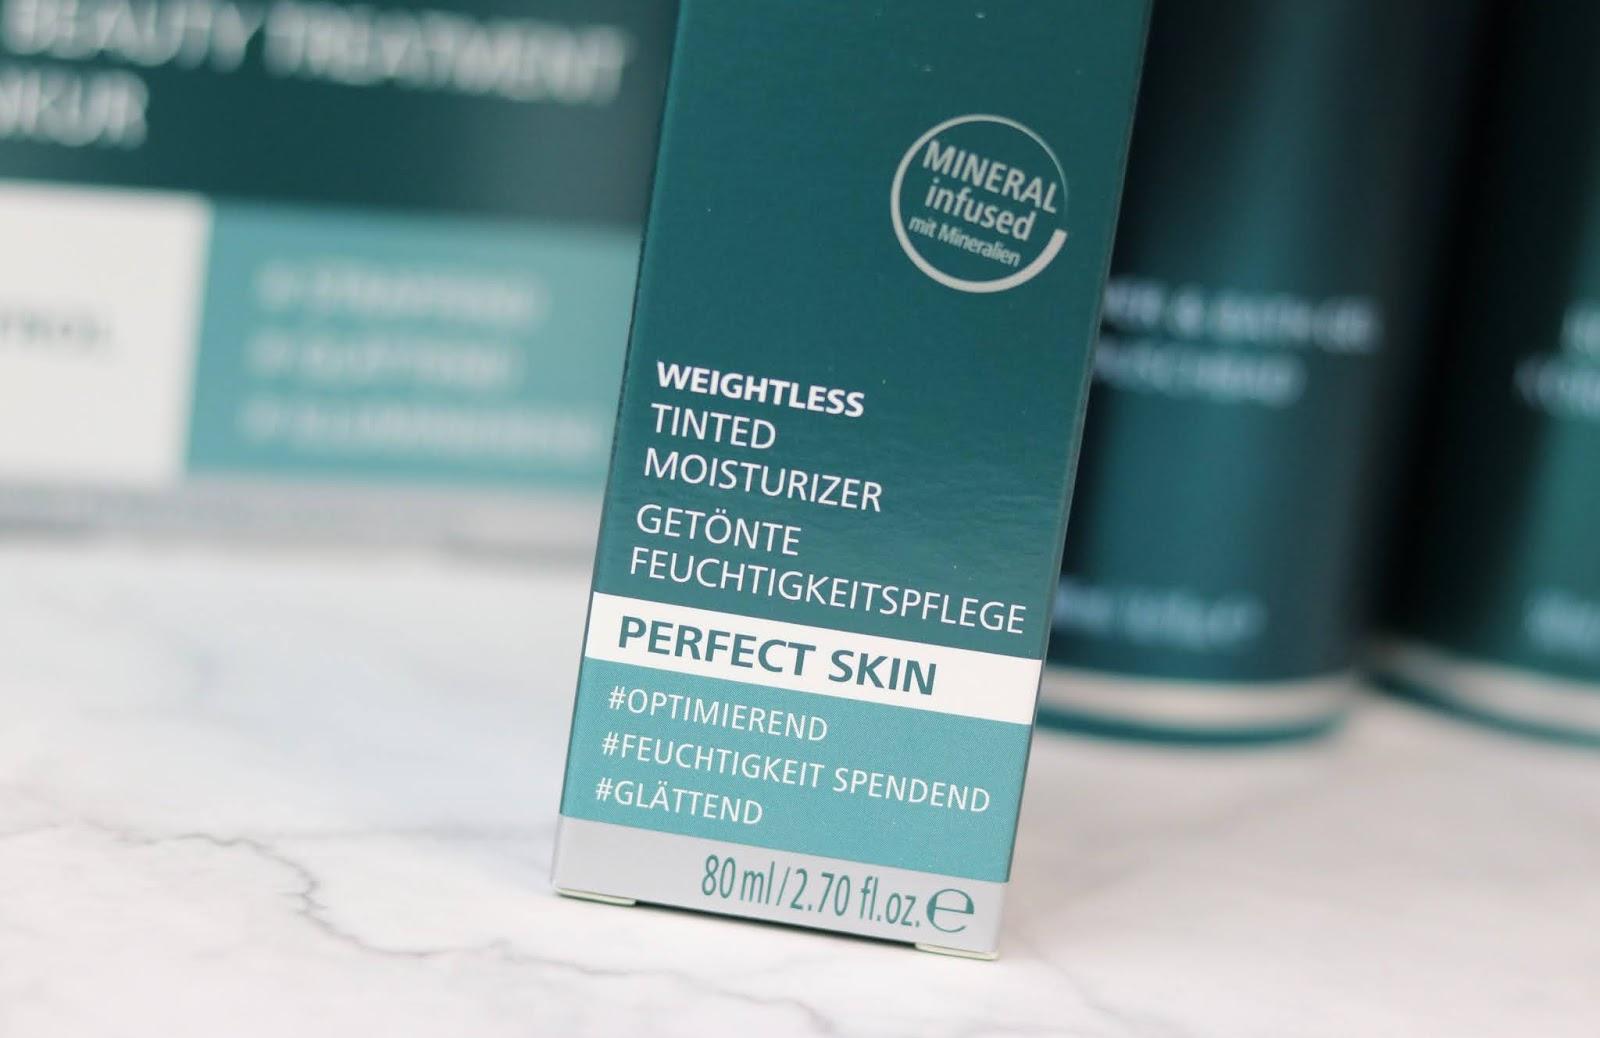 FLORA MARE Ocean Skin Therapy, QVC Beauty, Hautpflege, Review, Erfahrung, trockene und empfindliche haut, skincare, neuheiten, beauty blogger hamburg, ampullem, serum, anti-aging, Hautpflegeroutine,